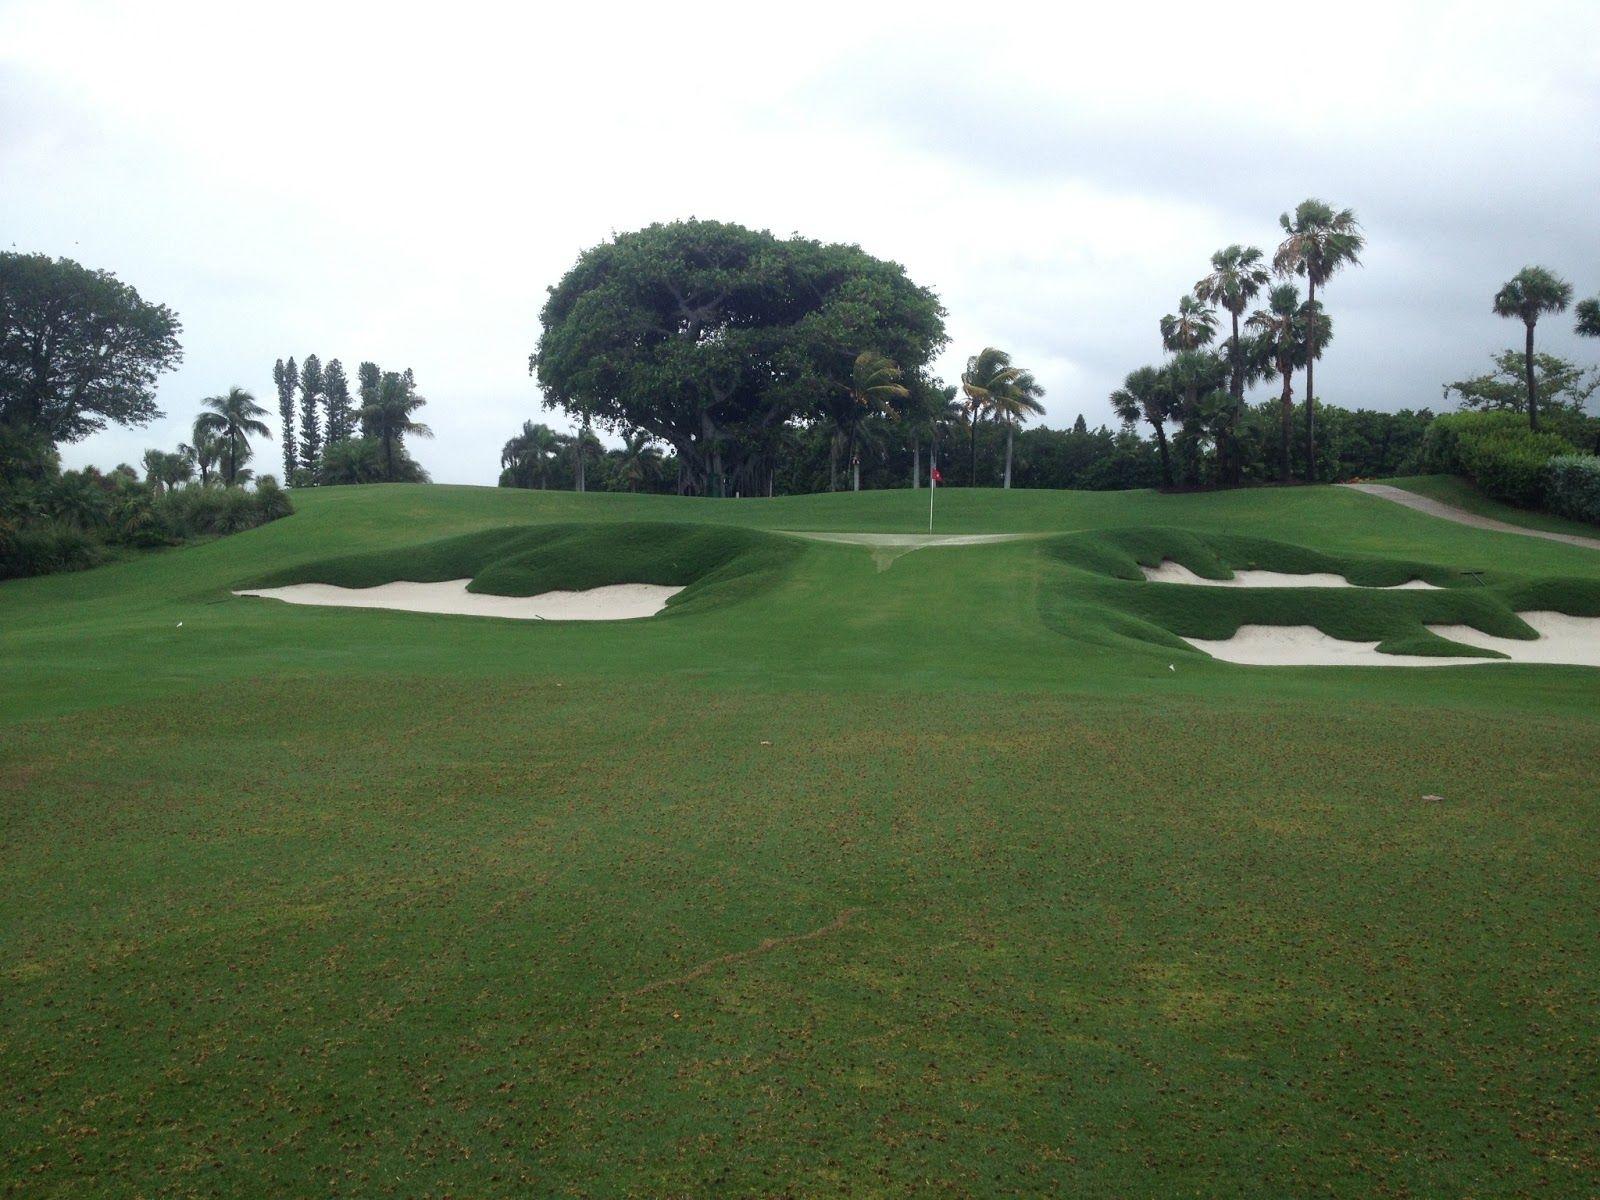 Palm Beach Country Club - Golf Course - All Square Golf